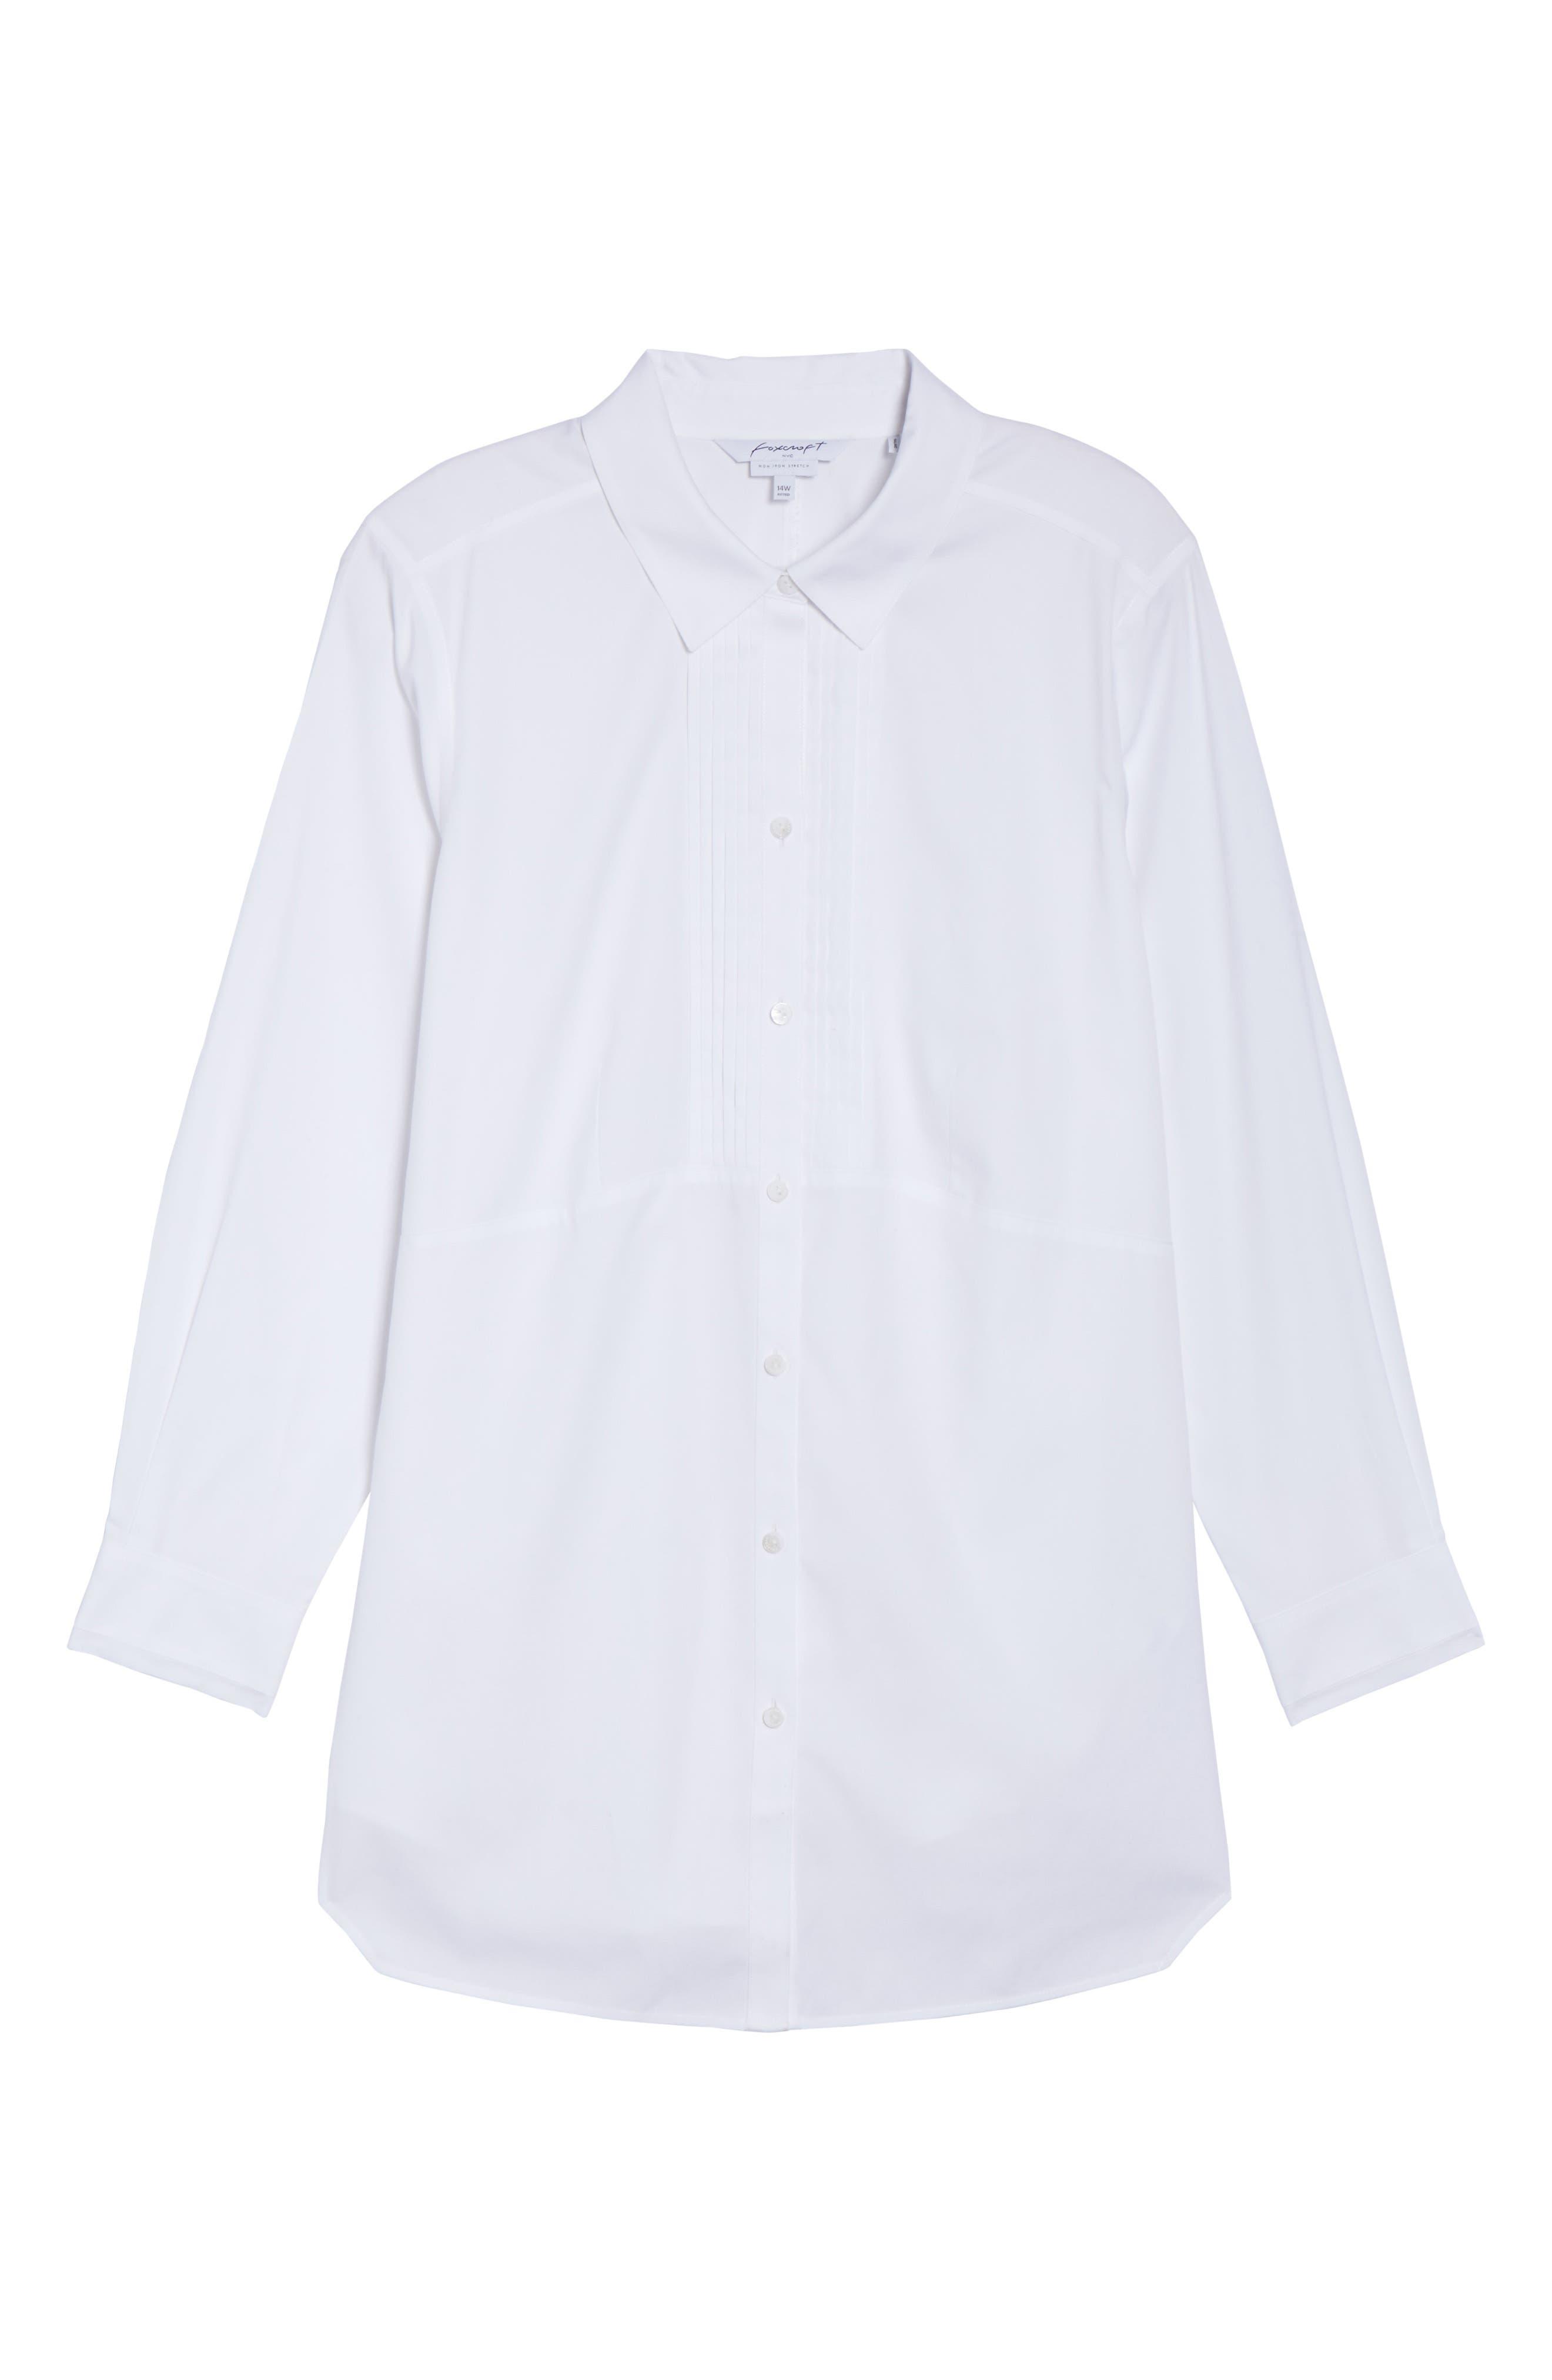 Sheri Stretch Cotton Shirt,                             Alternate thumbnail 6, color,                             100